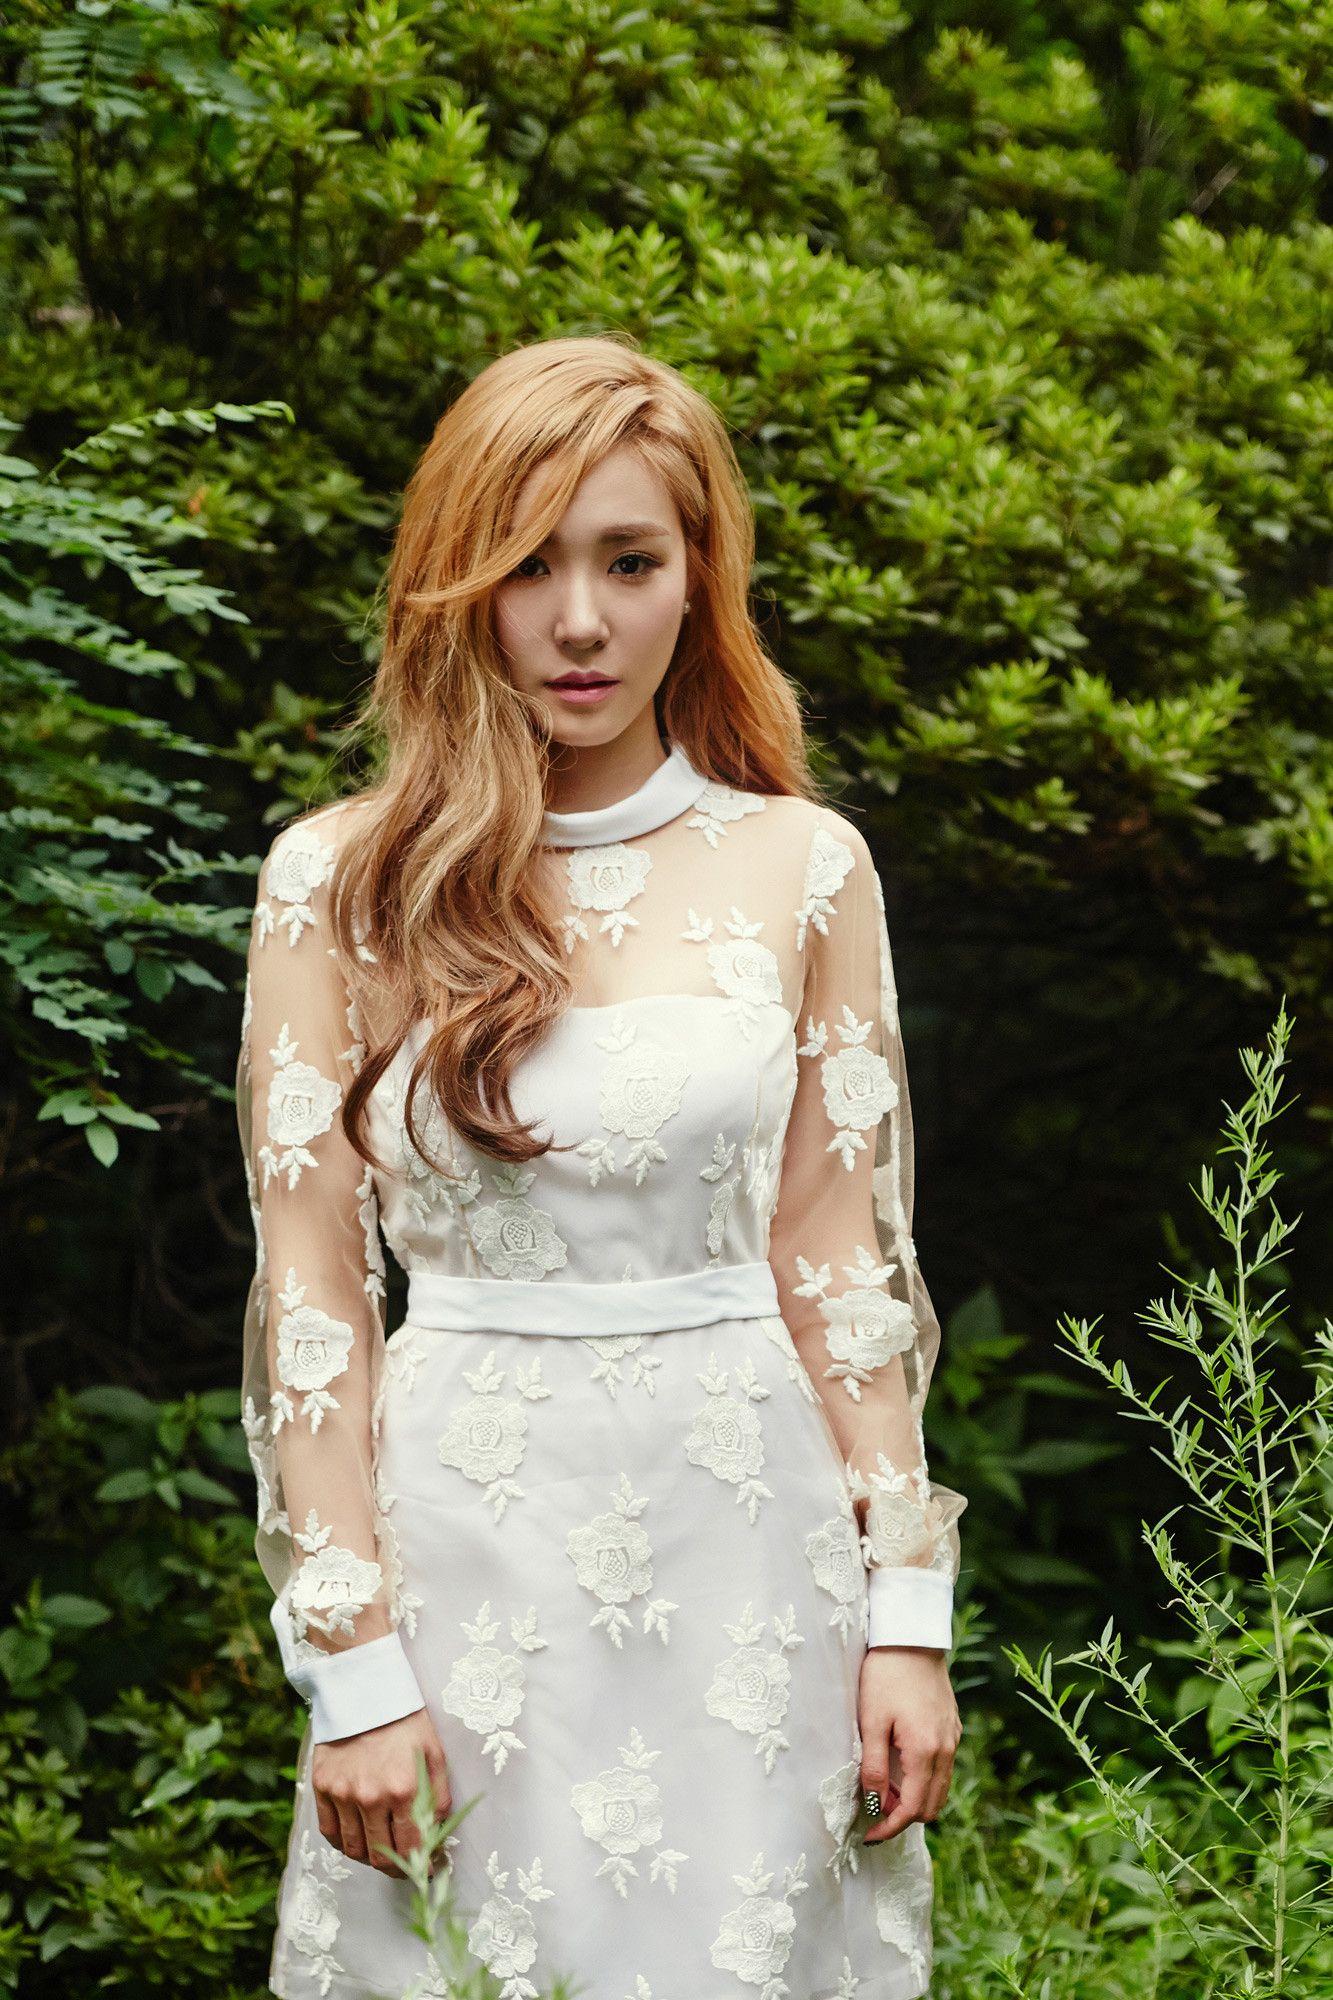 Snsd Tts Holler Girls Generation Tiffany Snsd Fashion Girls Generation Tts